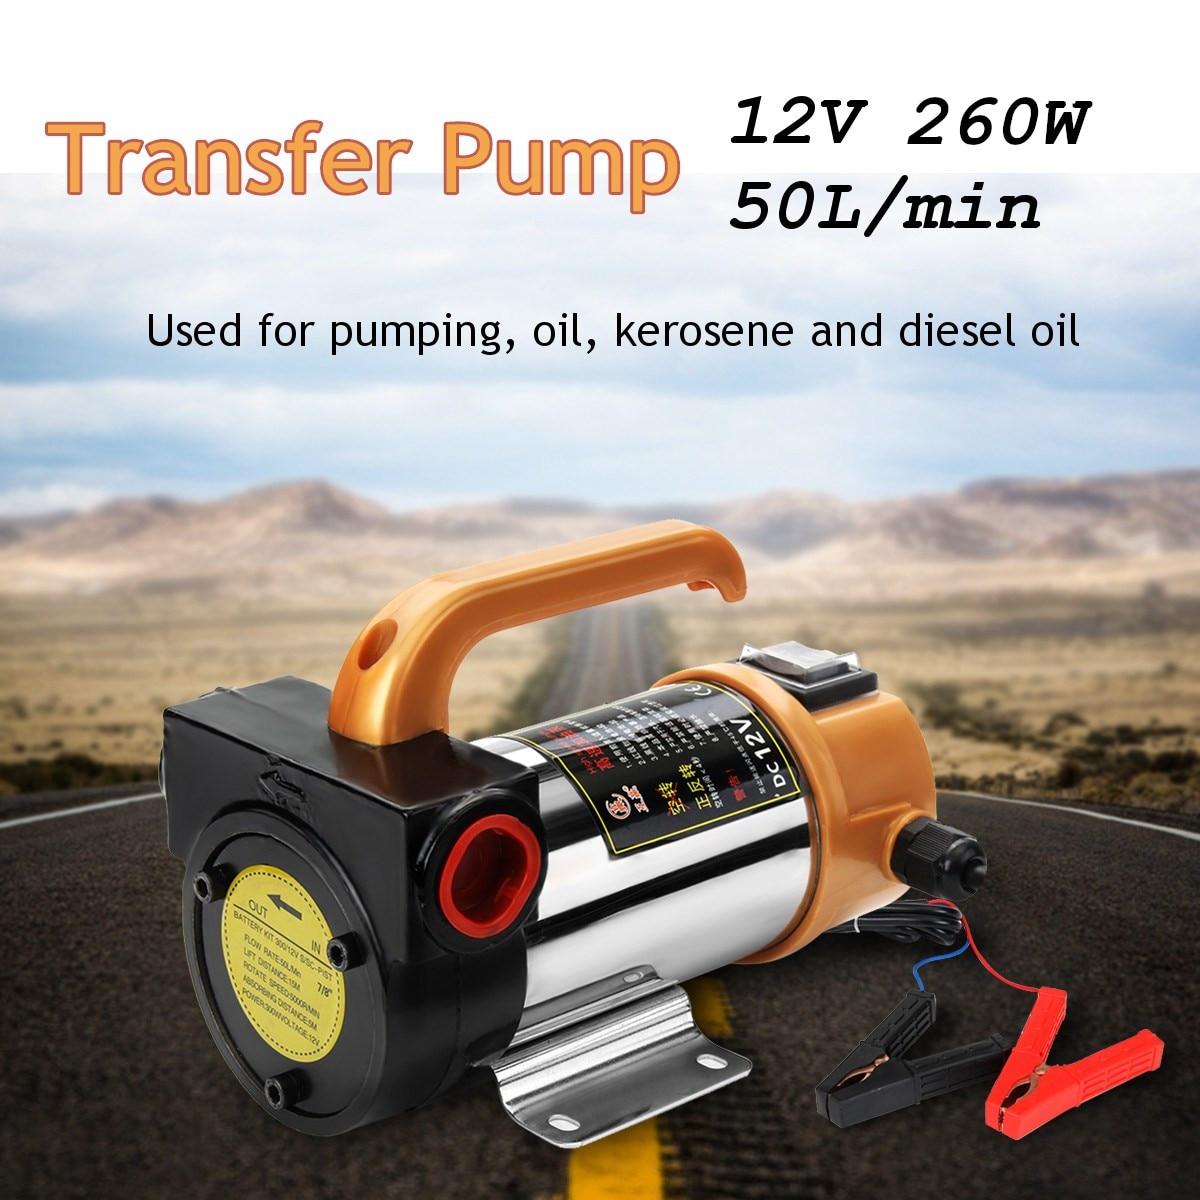 12 v 260 w motor do carro portátil para a bomba de transferência de óleo combustível diesel auto priming bomba de óleo 50l/min